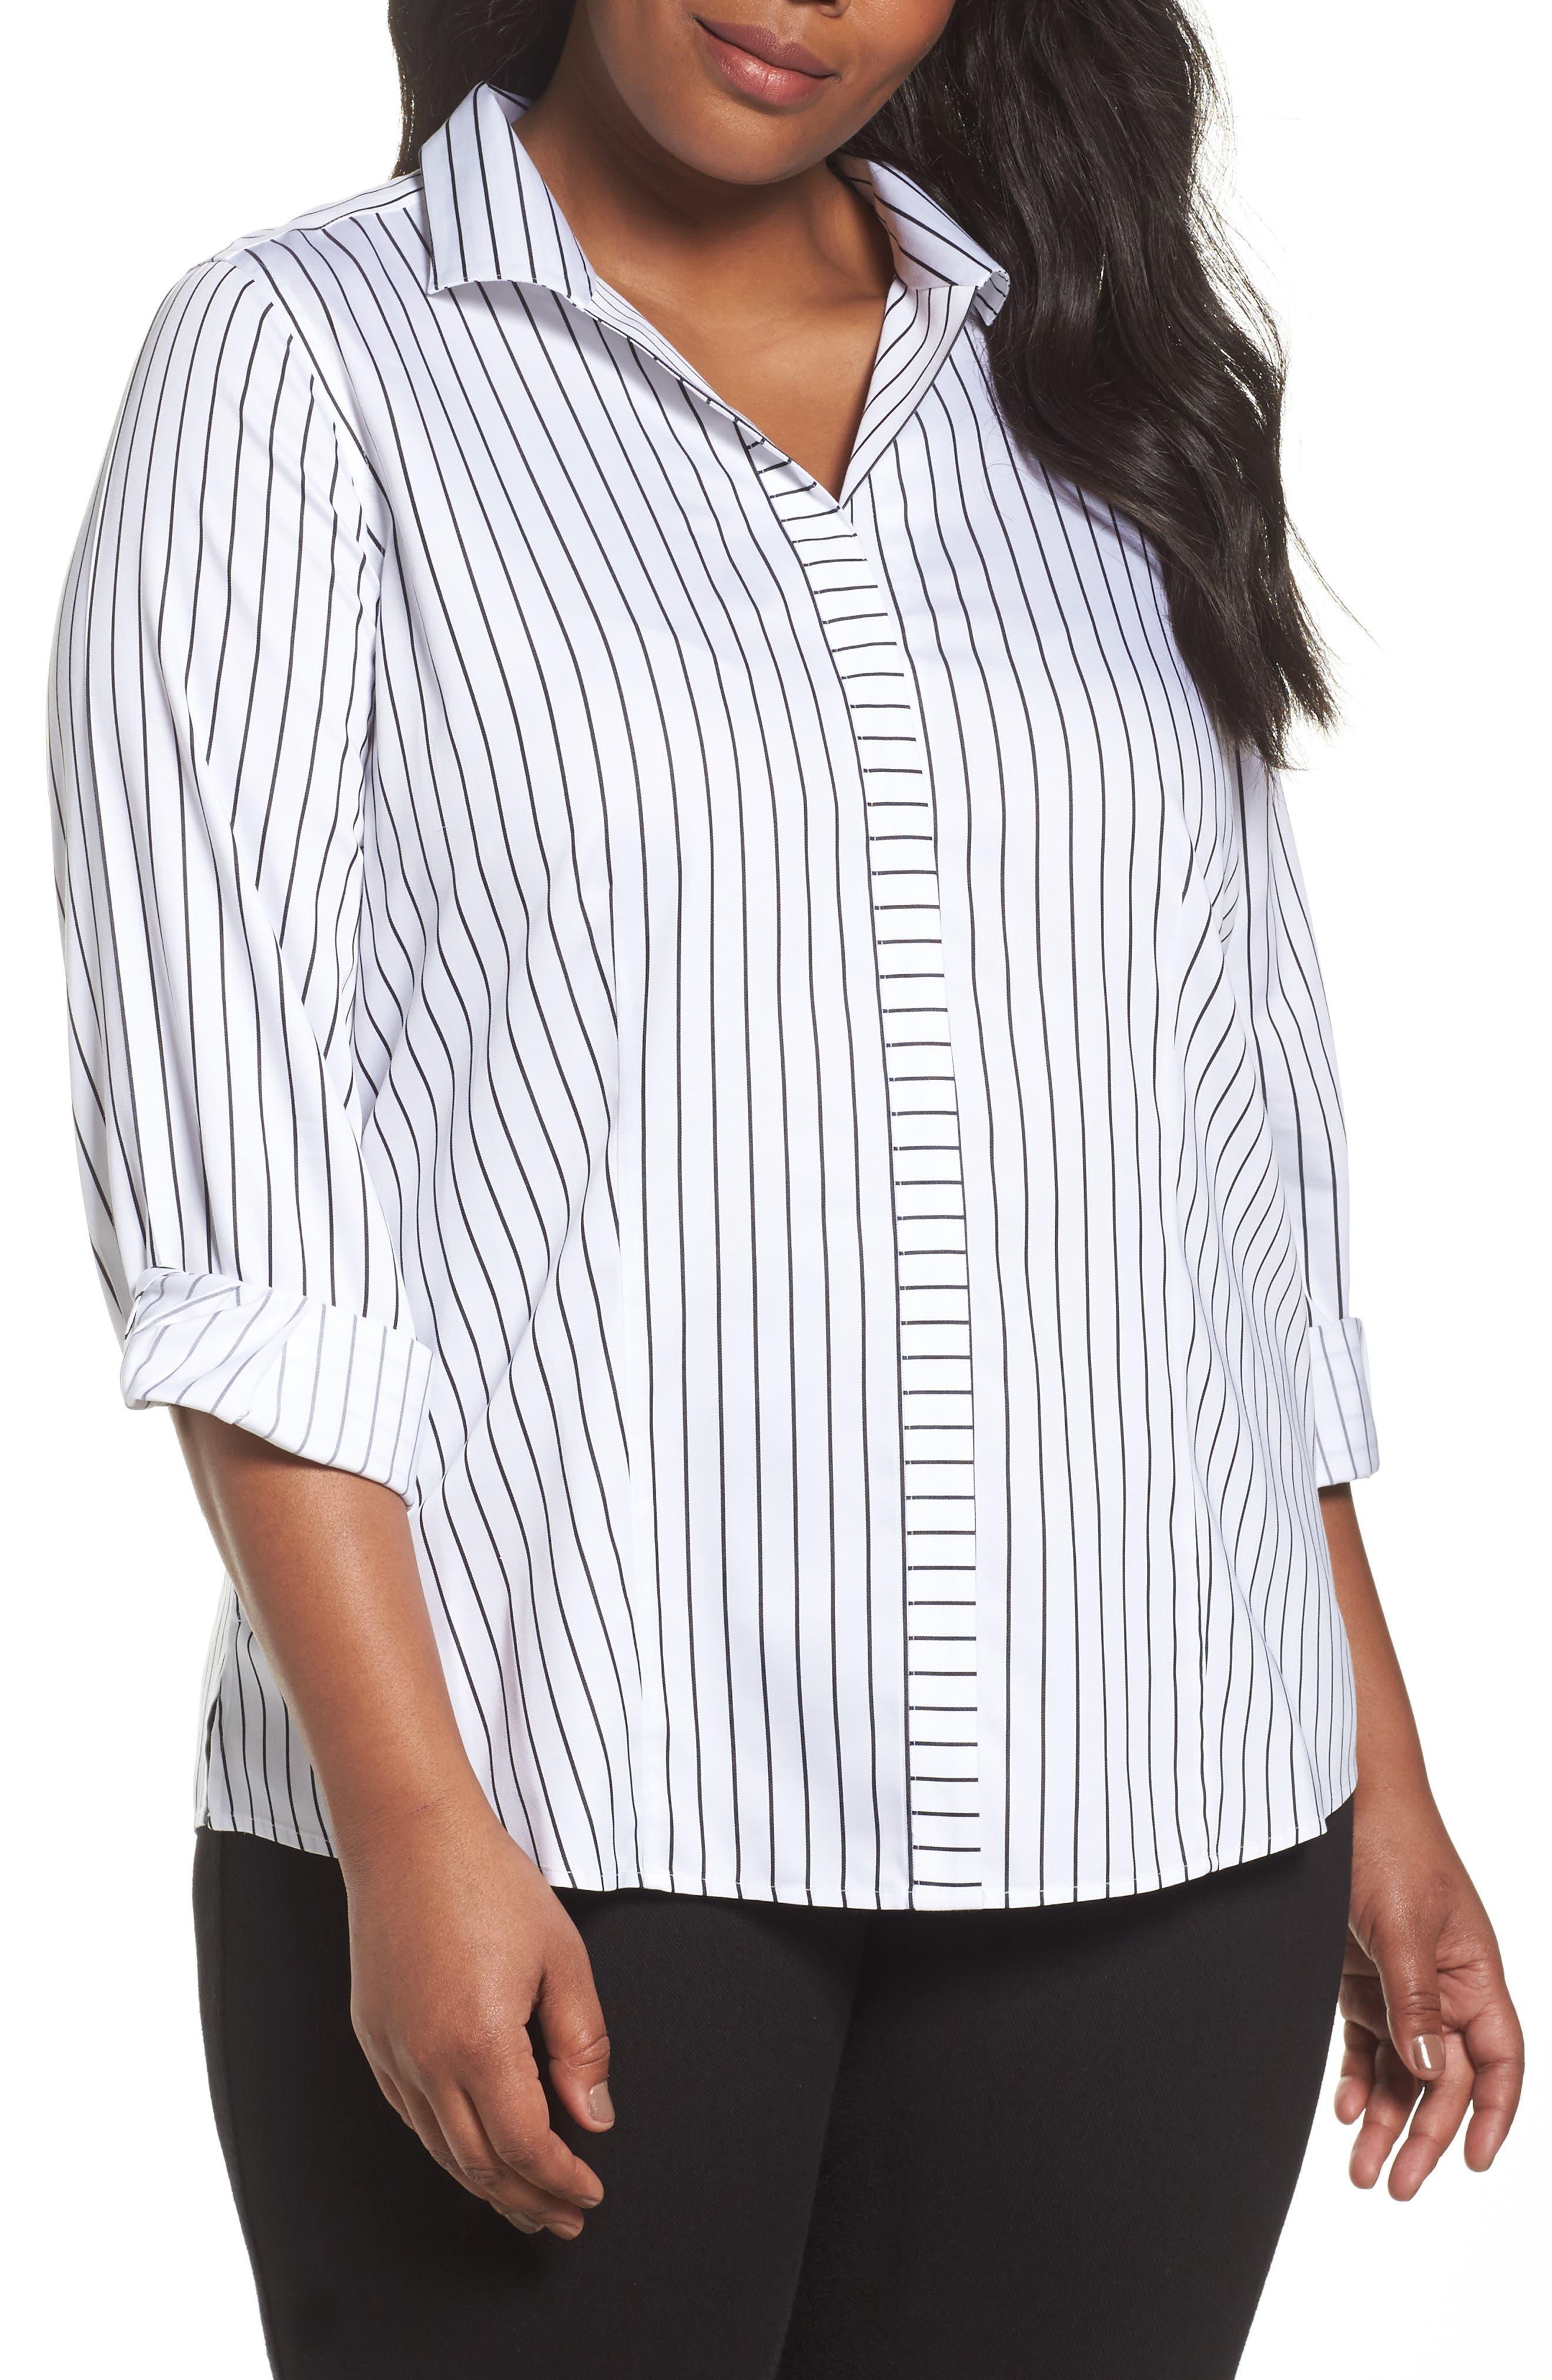 Annie Holiday Stripe Shirt,                         Main,                         color, White